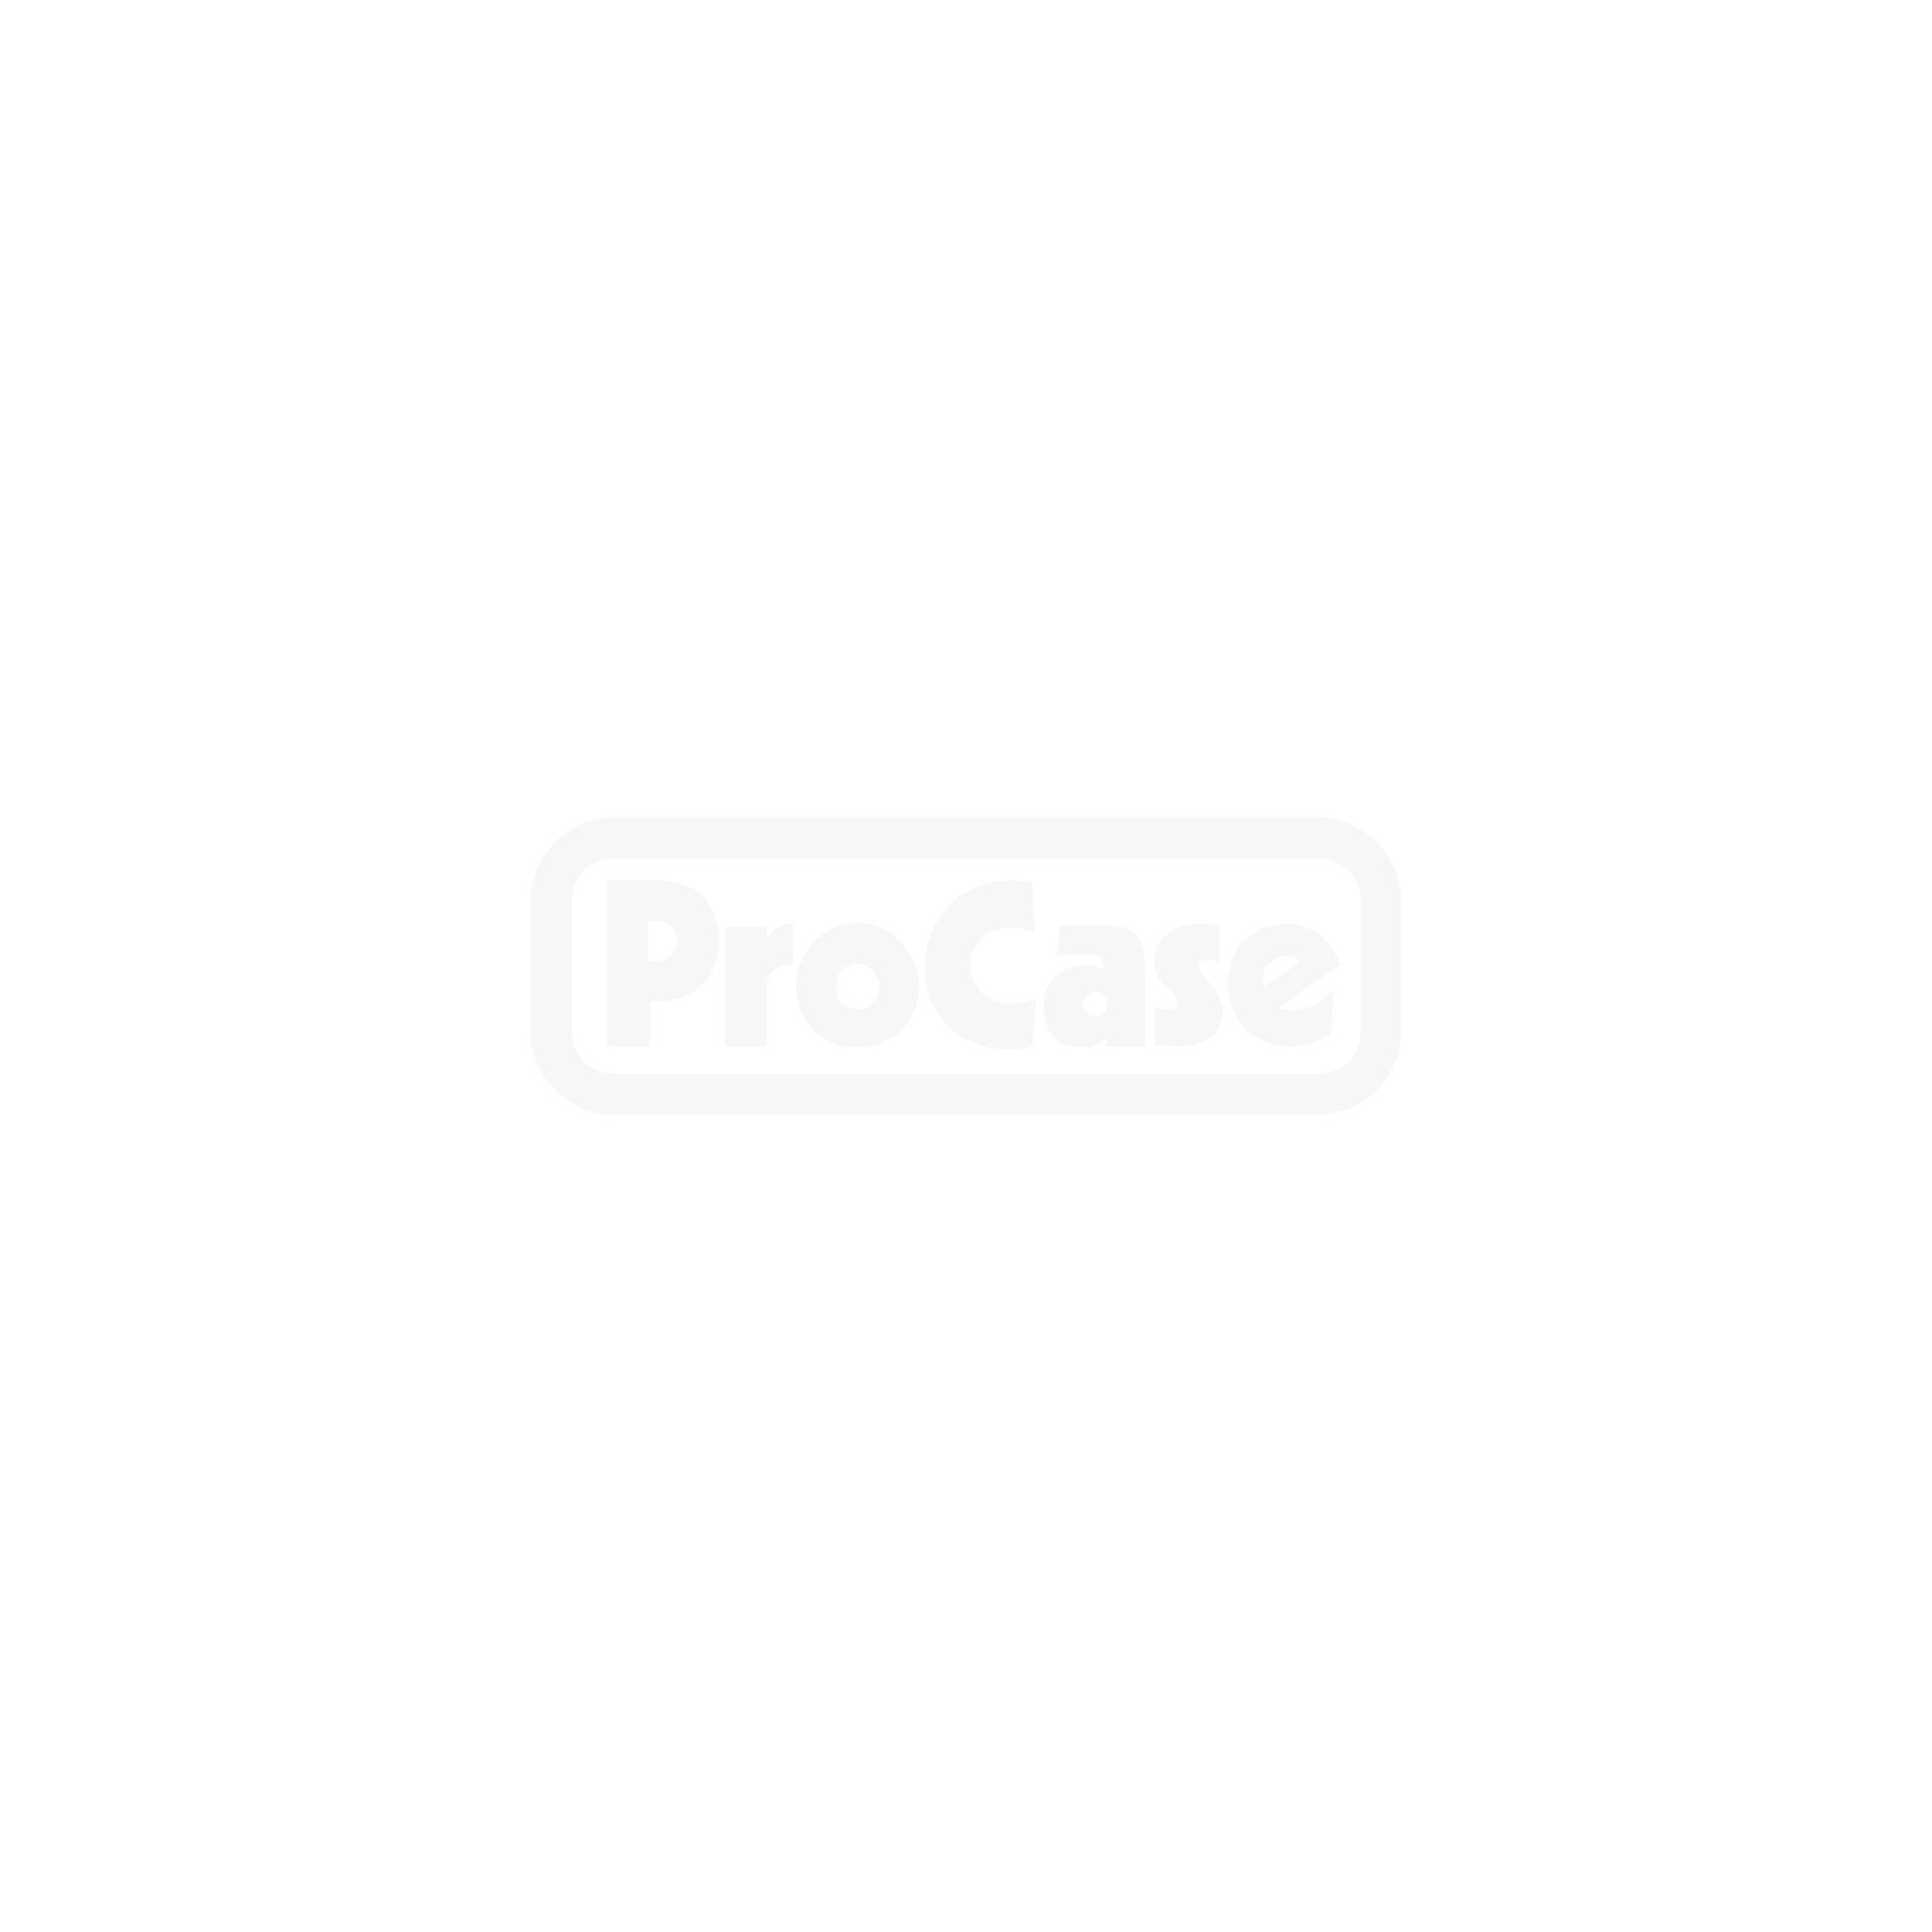 Transportcase Vario-Flex 90 Plus 750 mm hoch 2